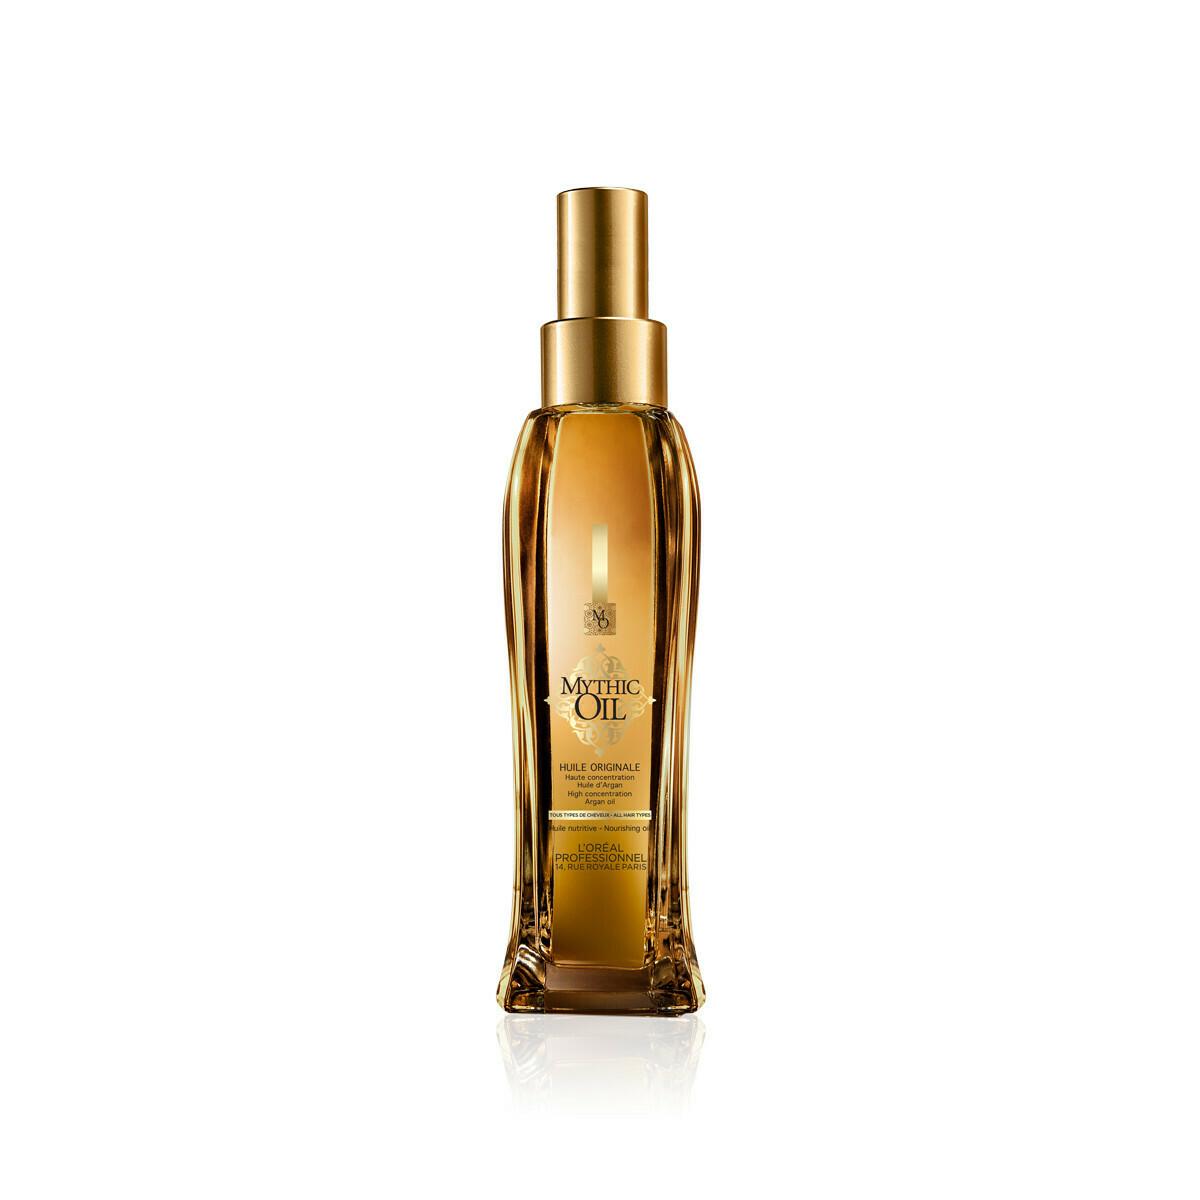 Huile nutritive - 100ml - Mythic Oil - Normaux L'Oréal Professionnel